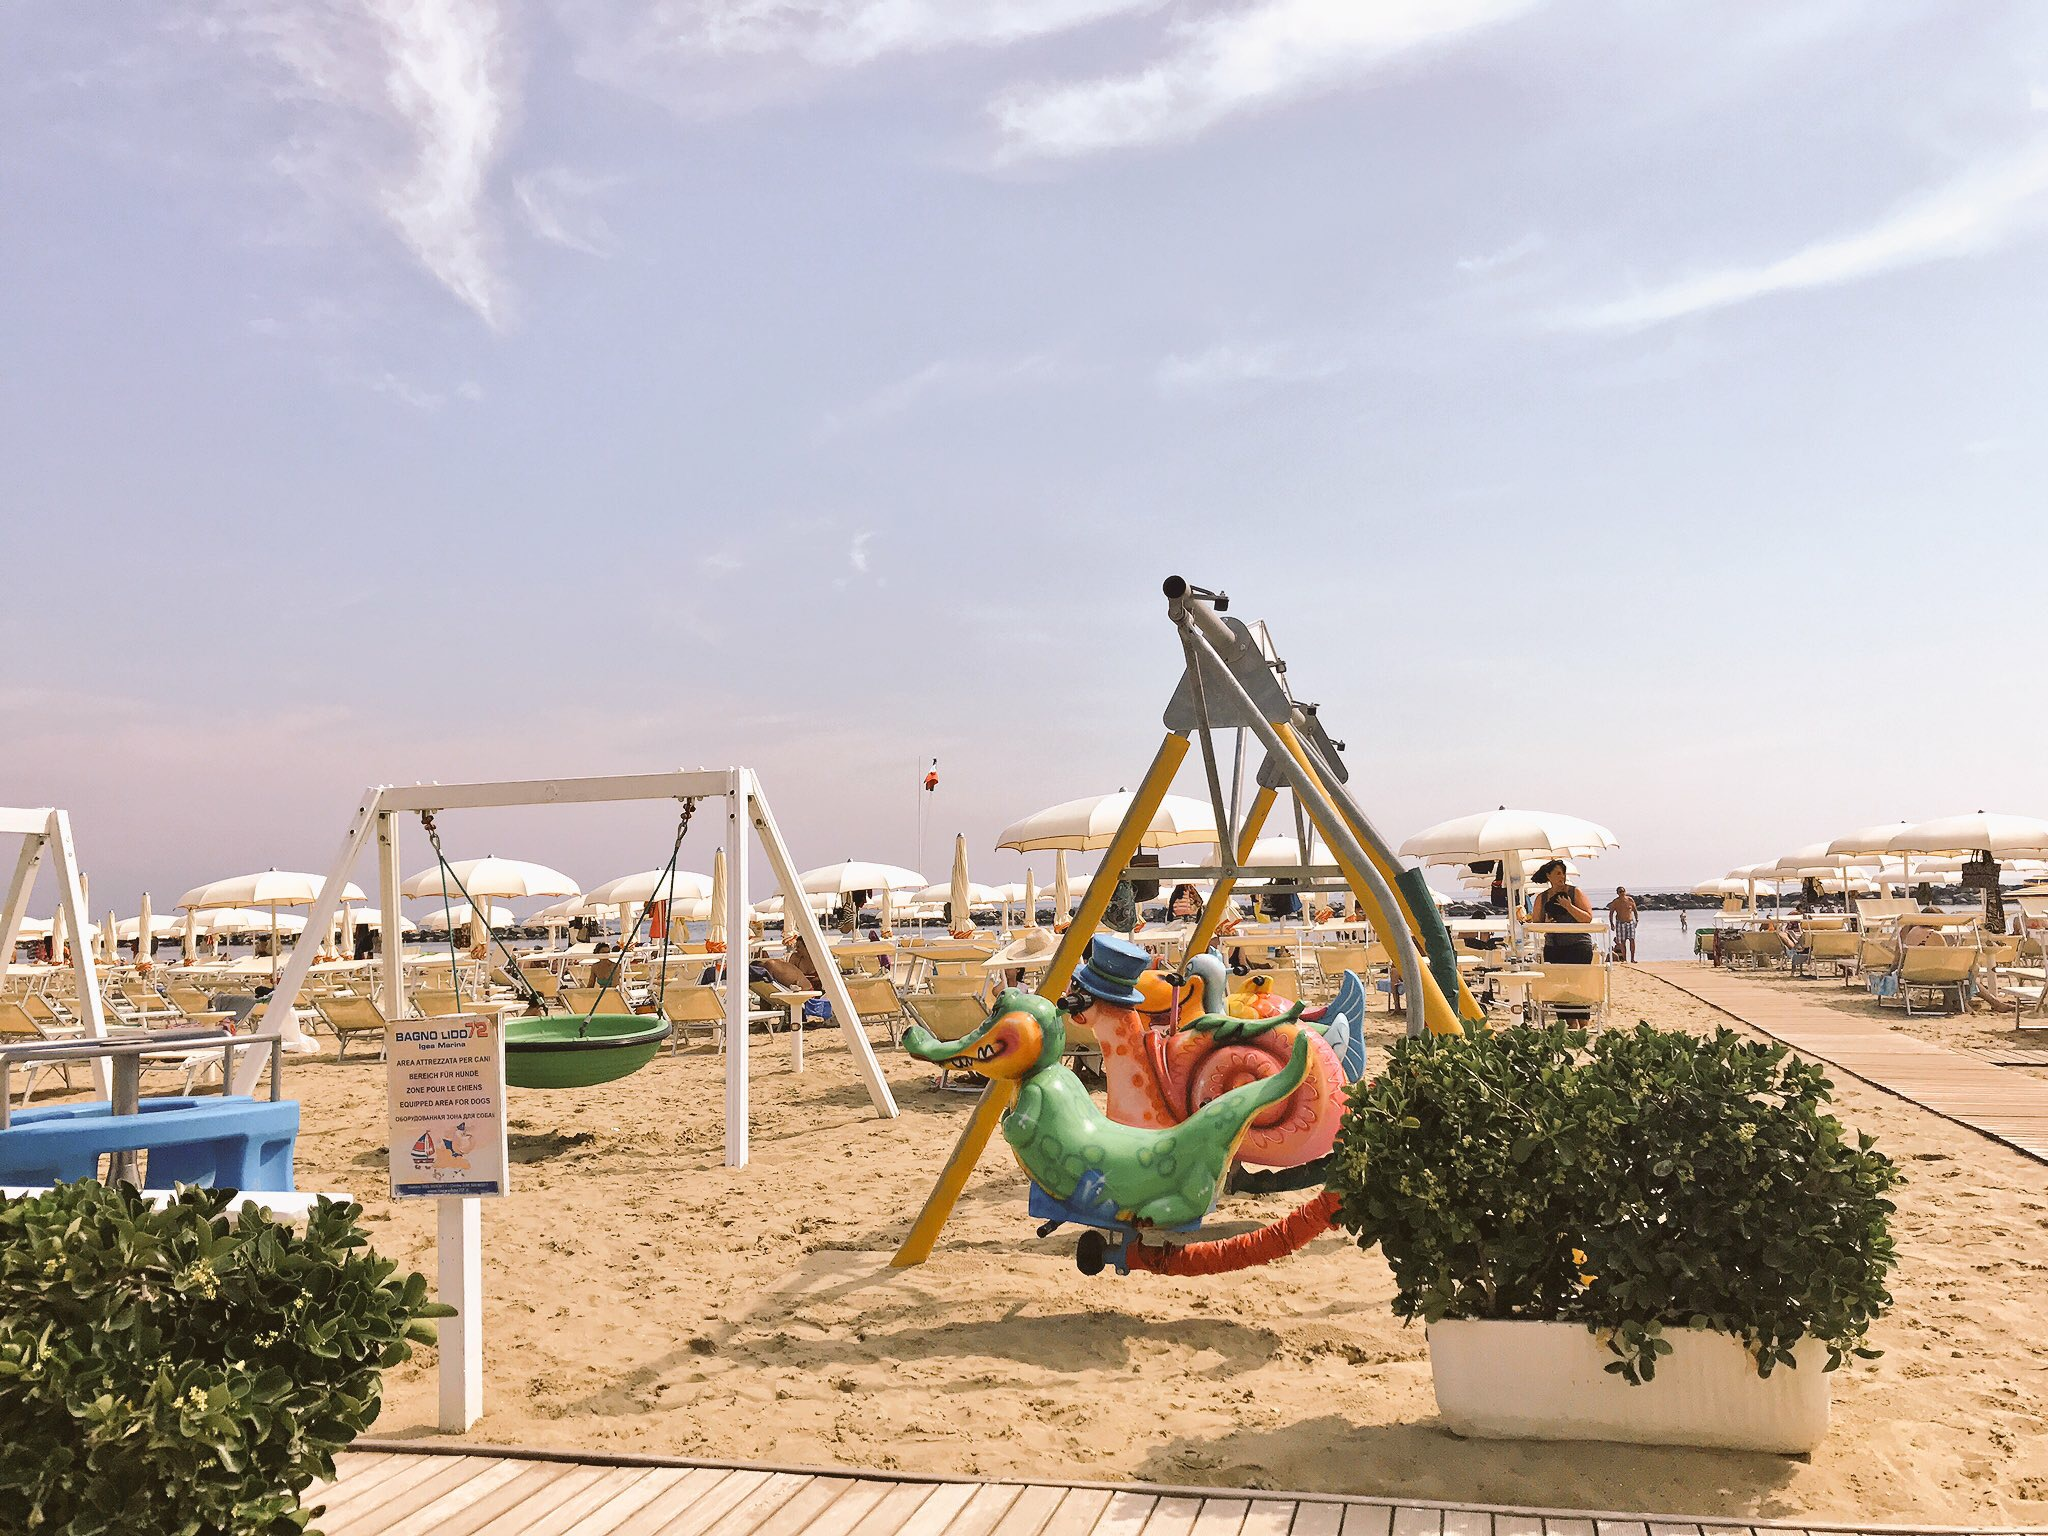 Parco Giochi Bagni 72 Bellaria Igea Marina